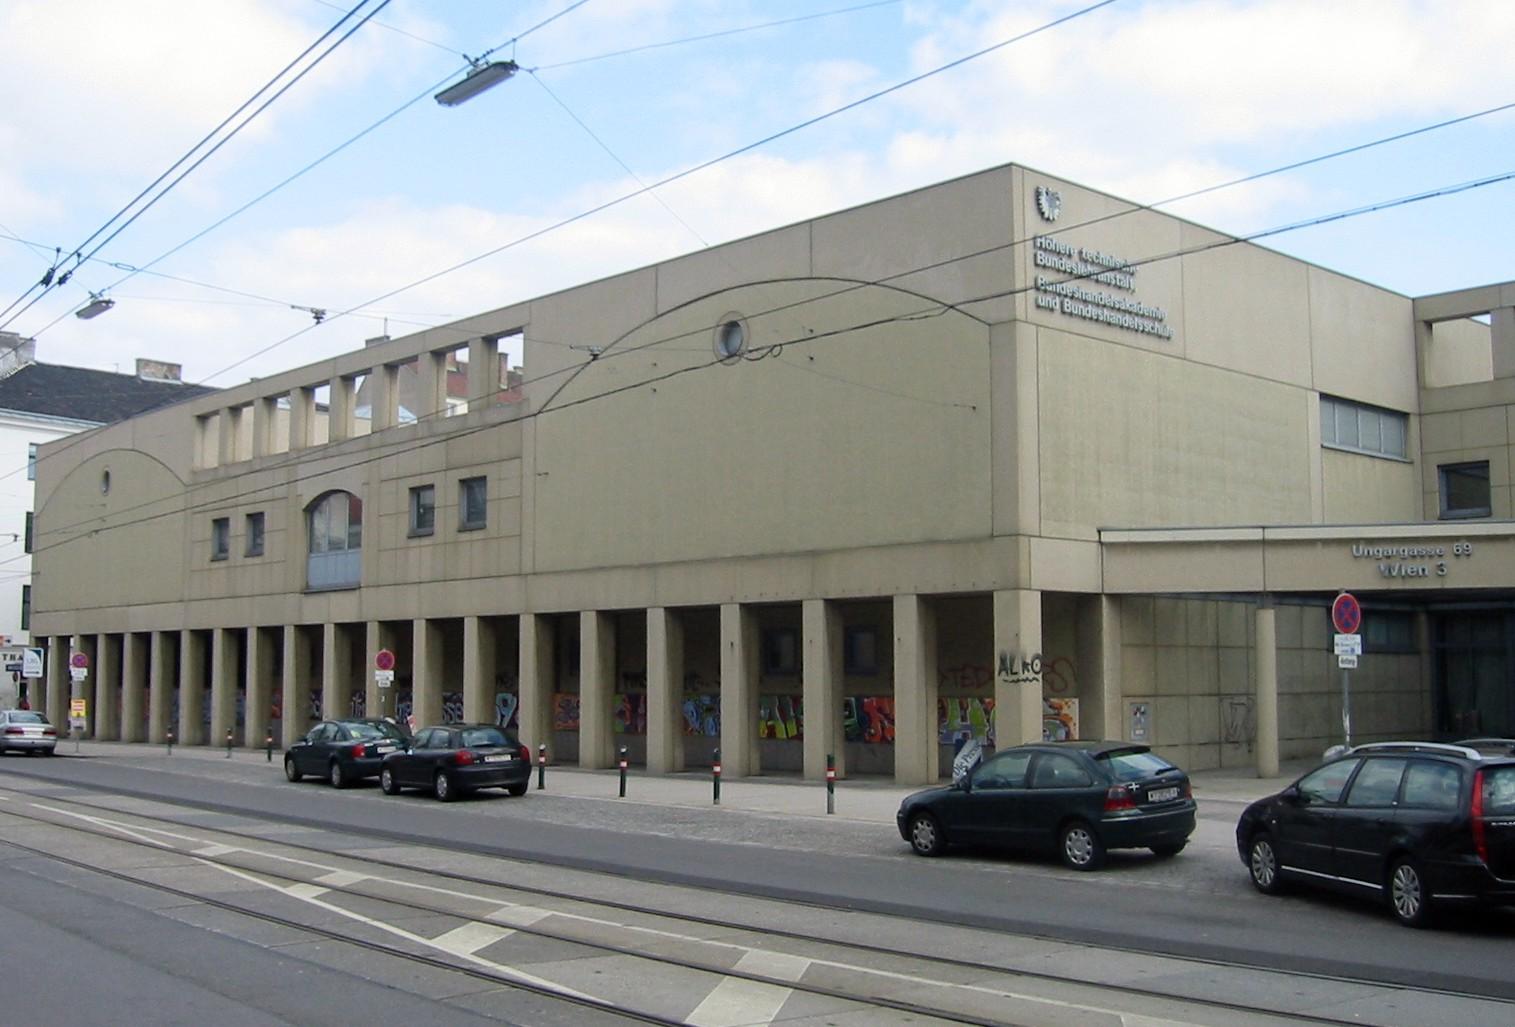 File:Schulzentrum Ungargasse Wien.jpg - Wikimedia Commons